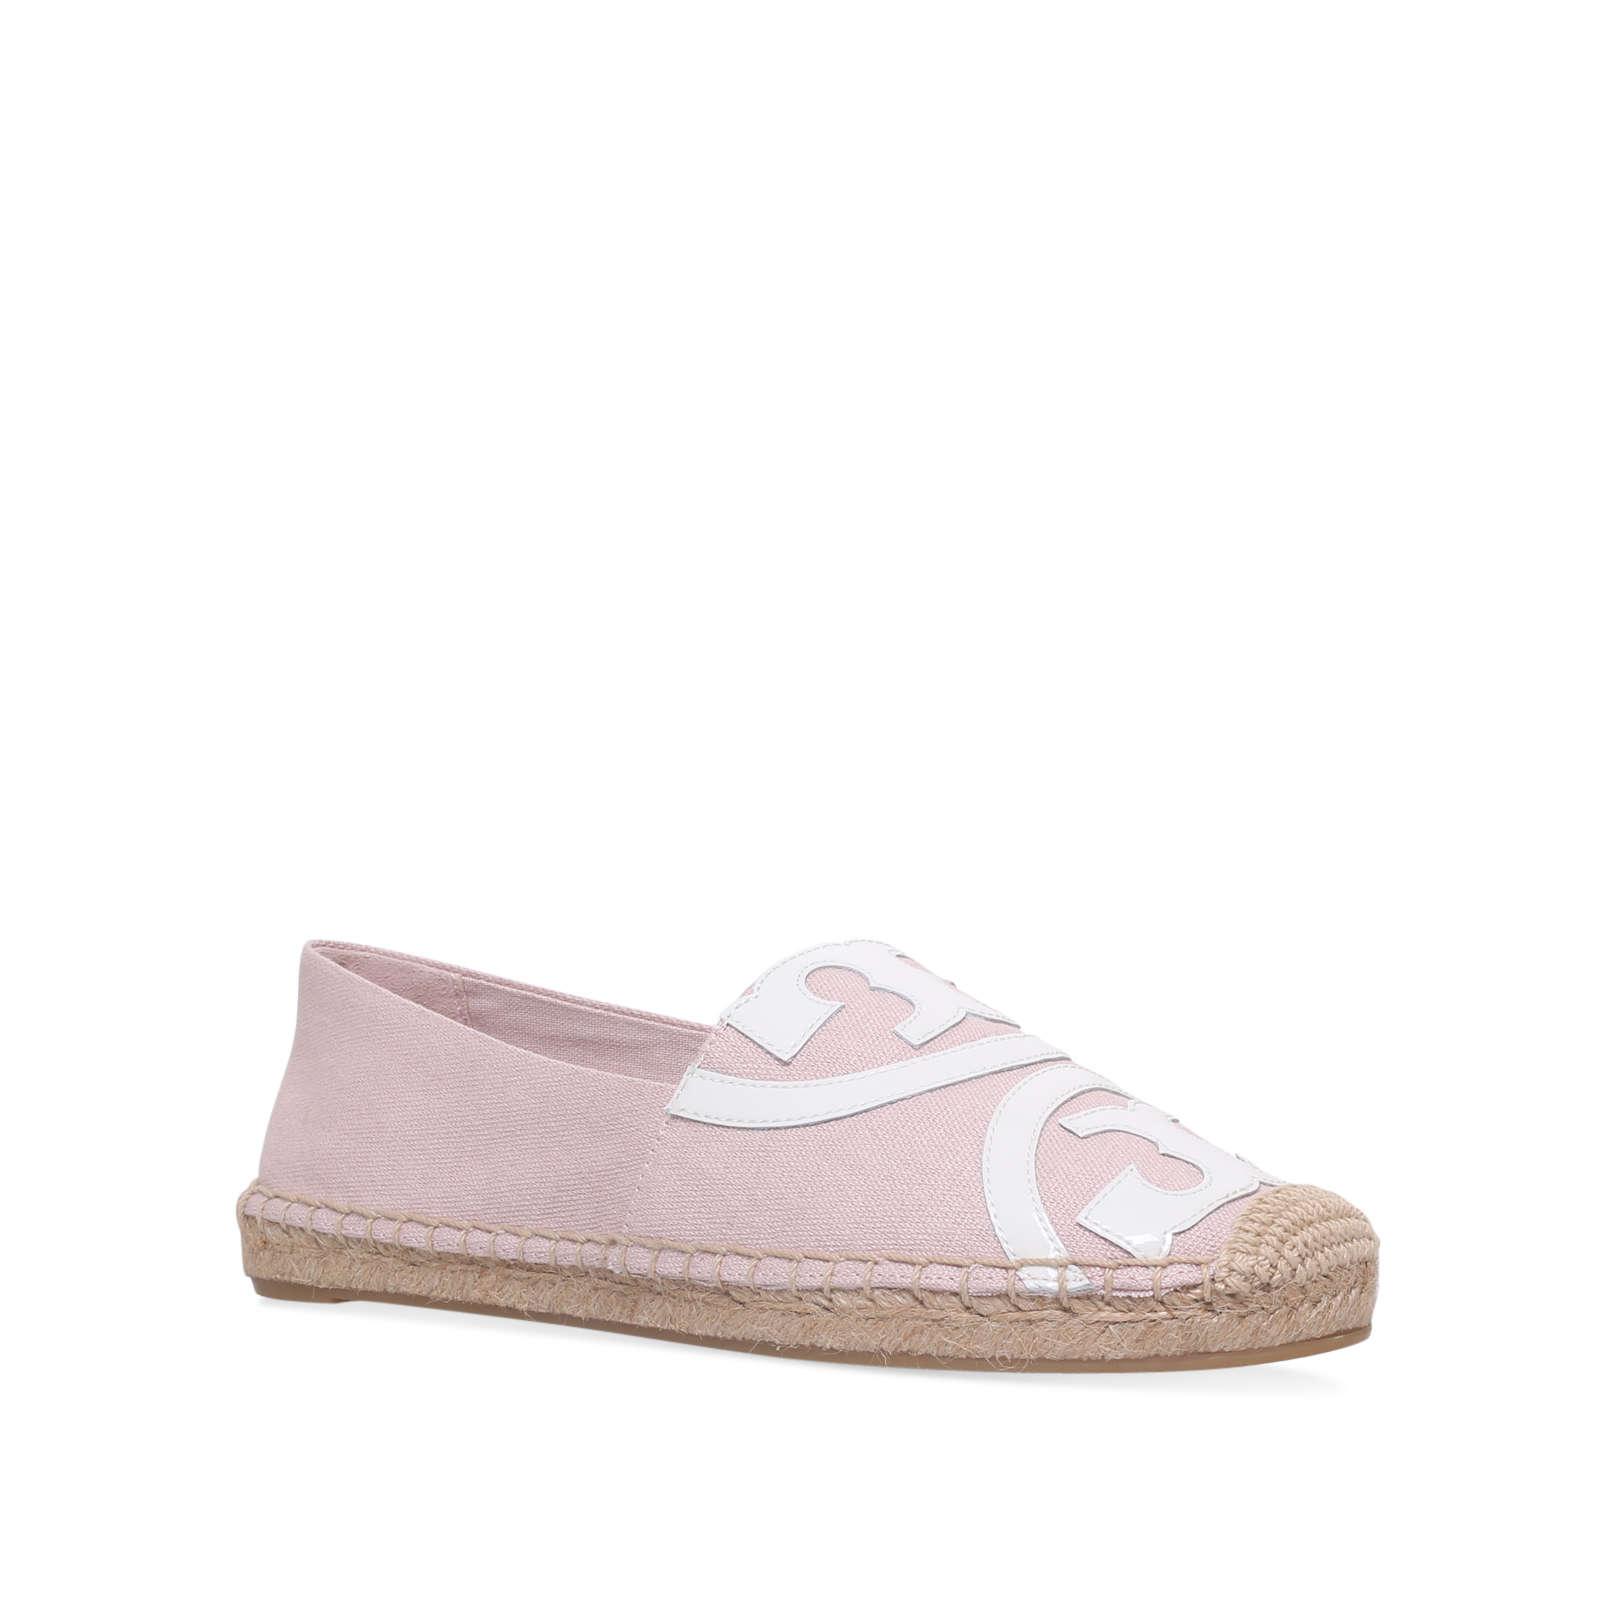 5310492ba23 POPPY ESPADRILLE Poppy Espadrille Summer Tory Burch Pale Pink by TORY BURCH